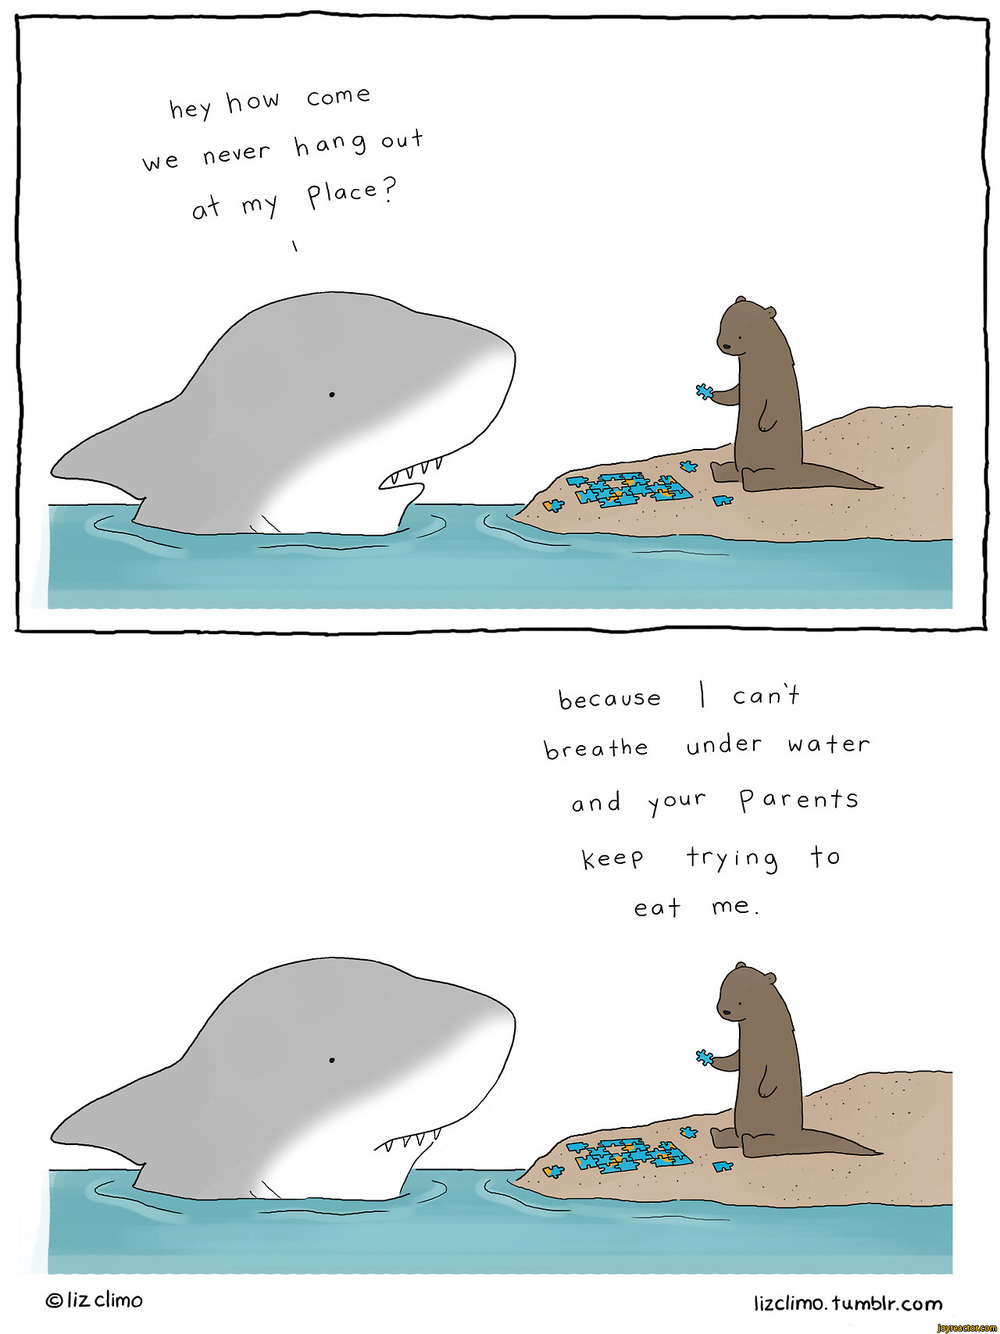 lizclimo-comics-shark-friends-1422674.jpeg